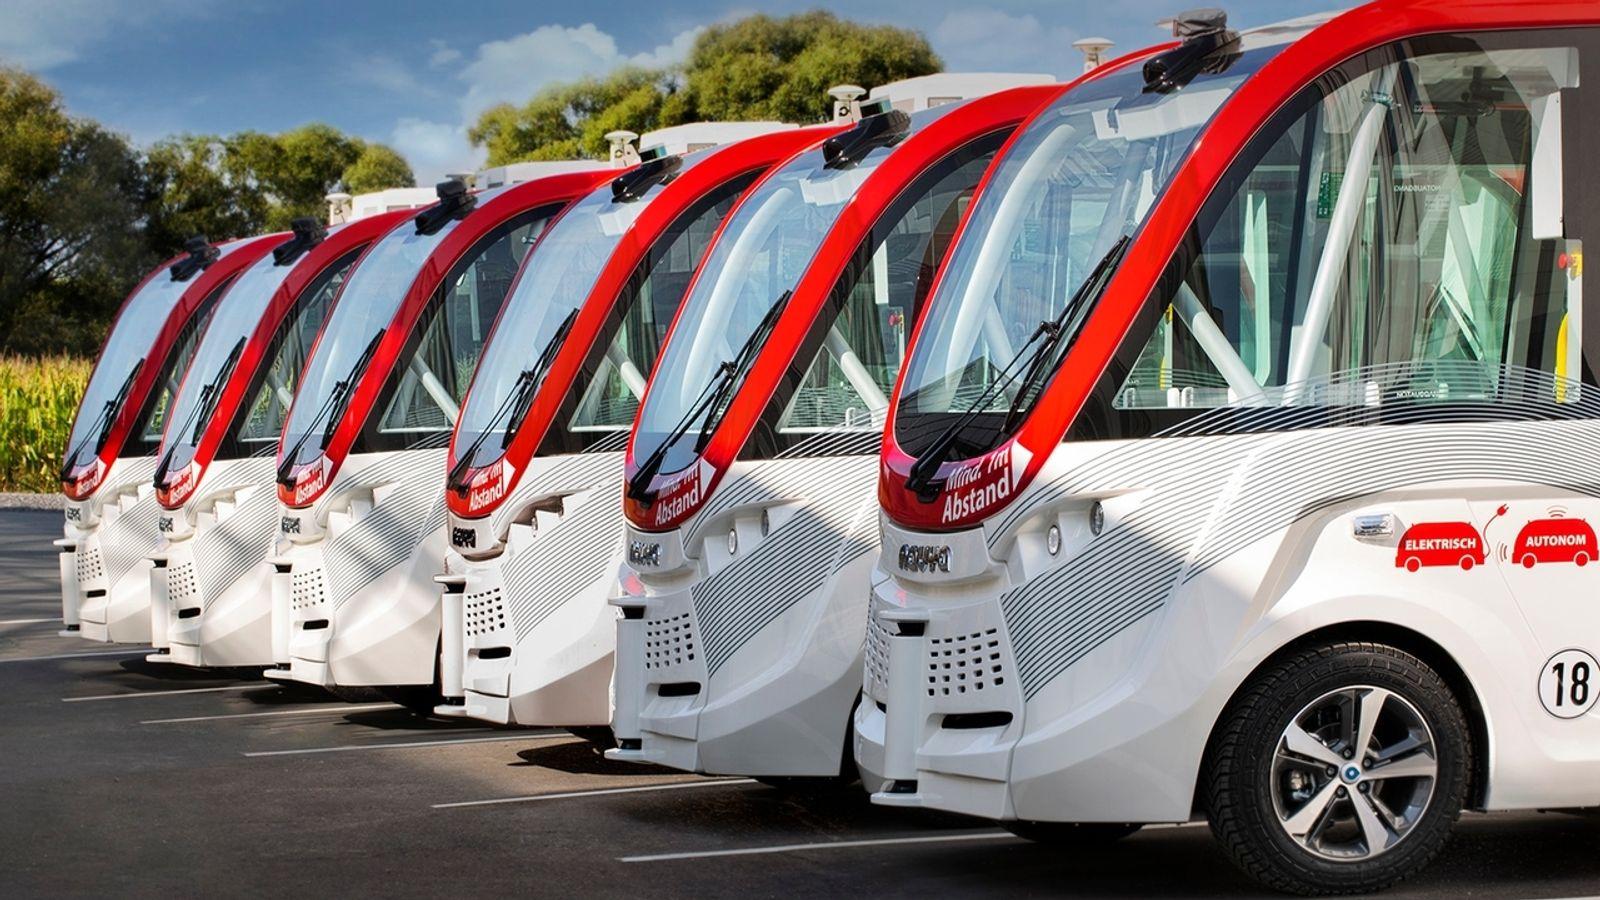 Begleitpersonal testet in Hof selbstfahrende Busse